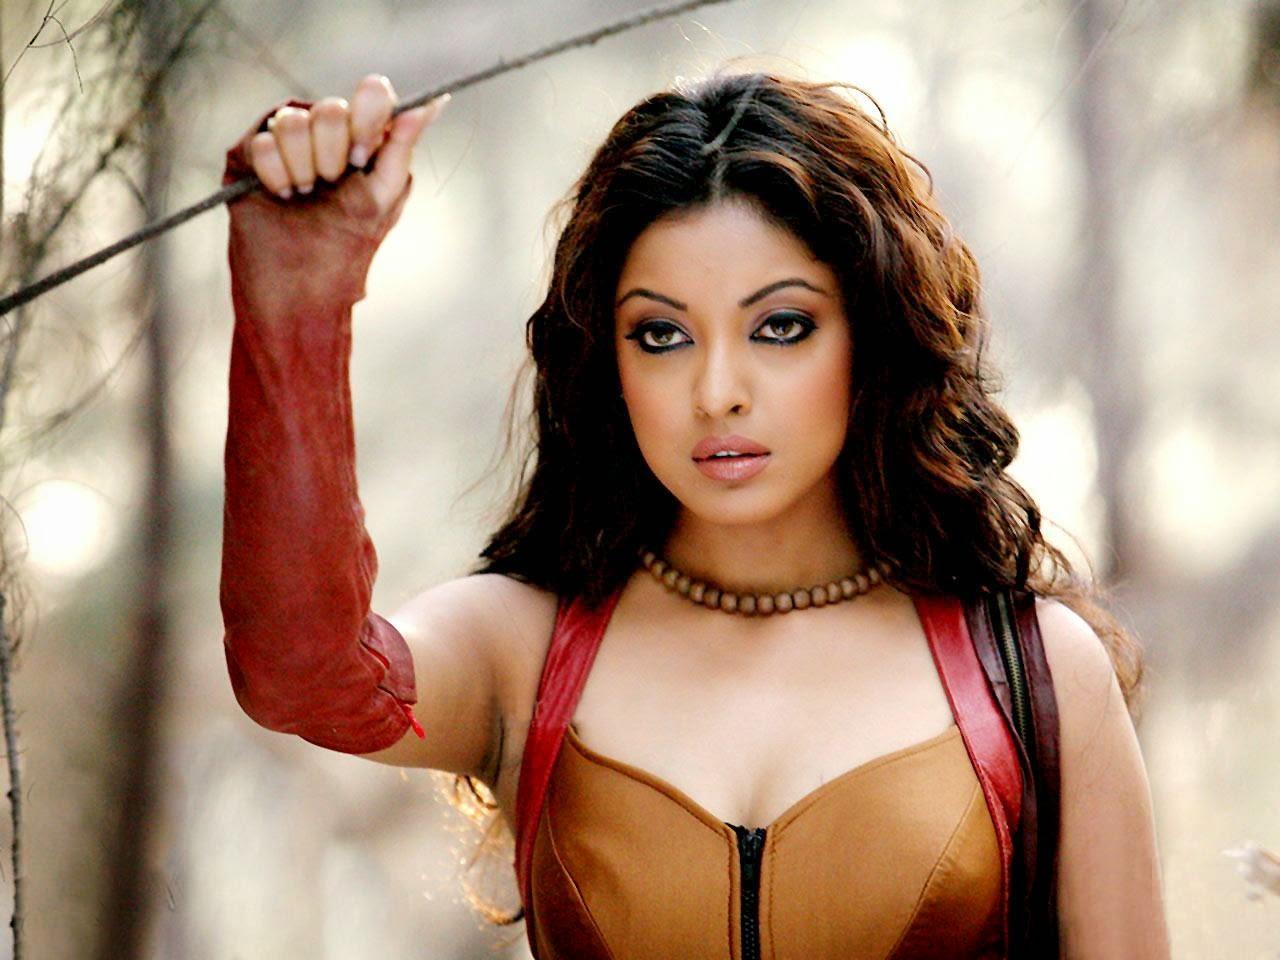 Hd Wallpapers Indian Actress Tanushree Dutta Desktop Wallpapers